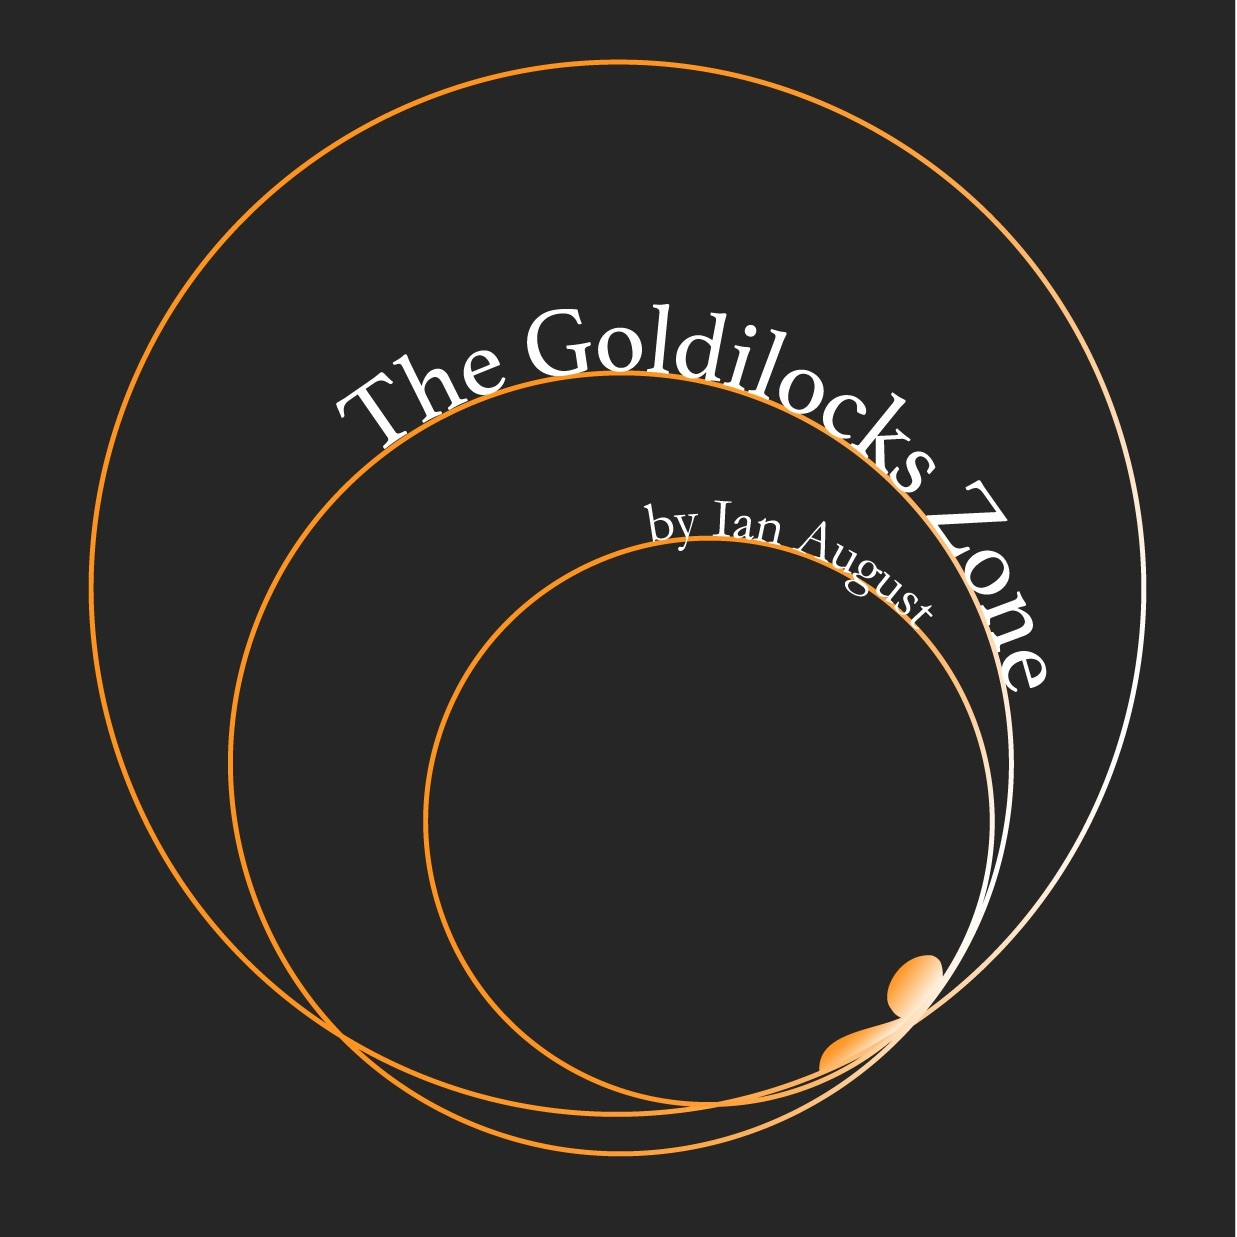 The Goldilocks Zone - A New Play